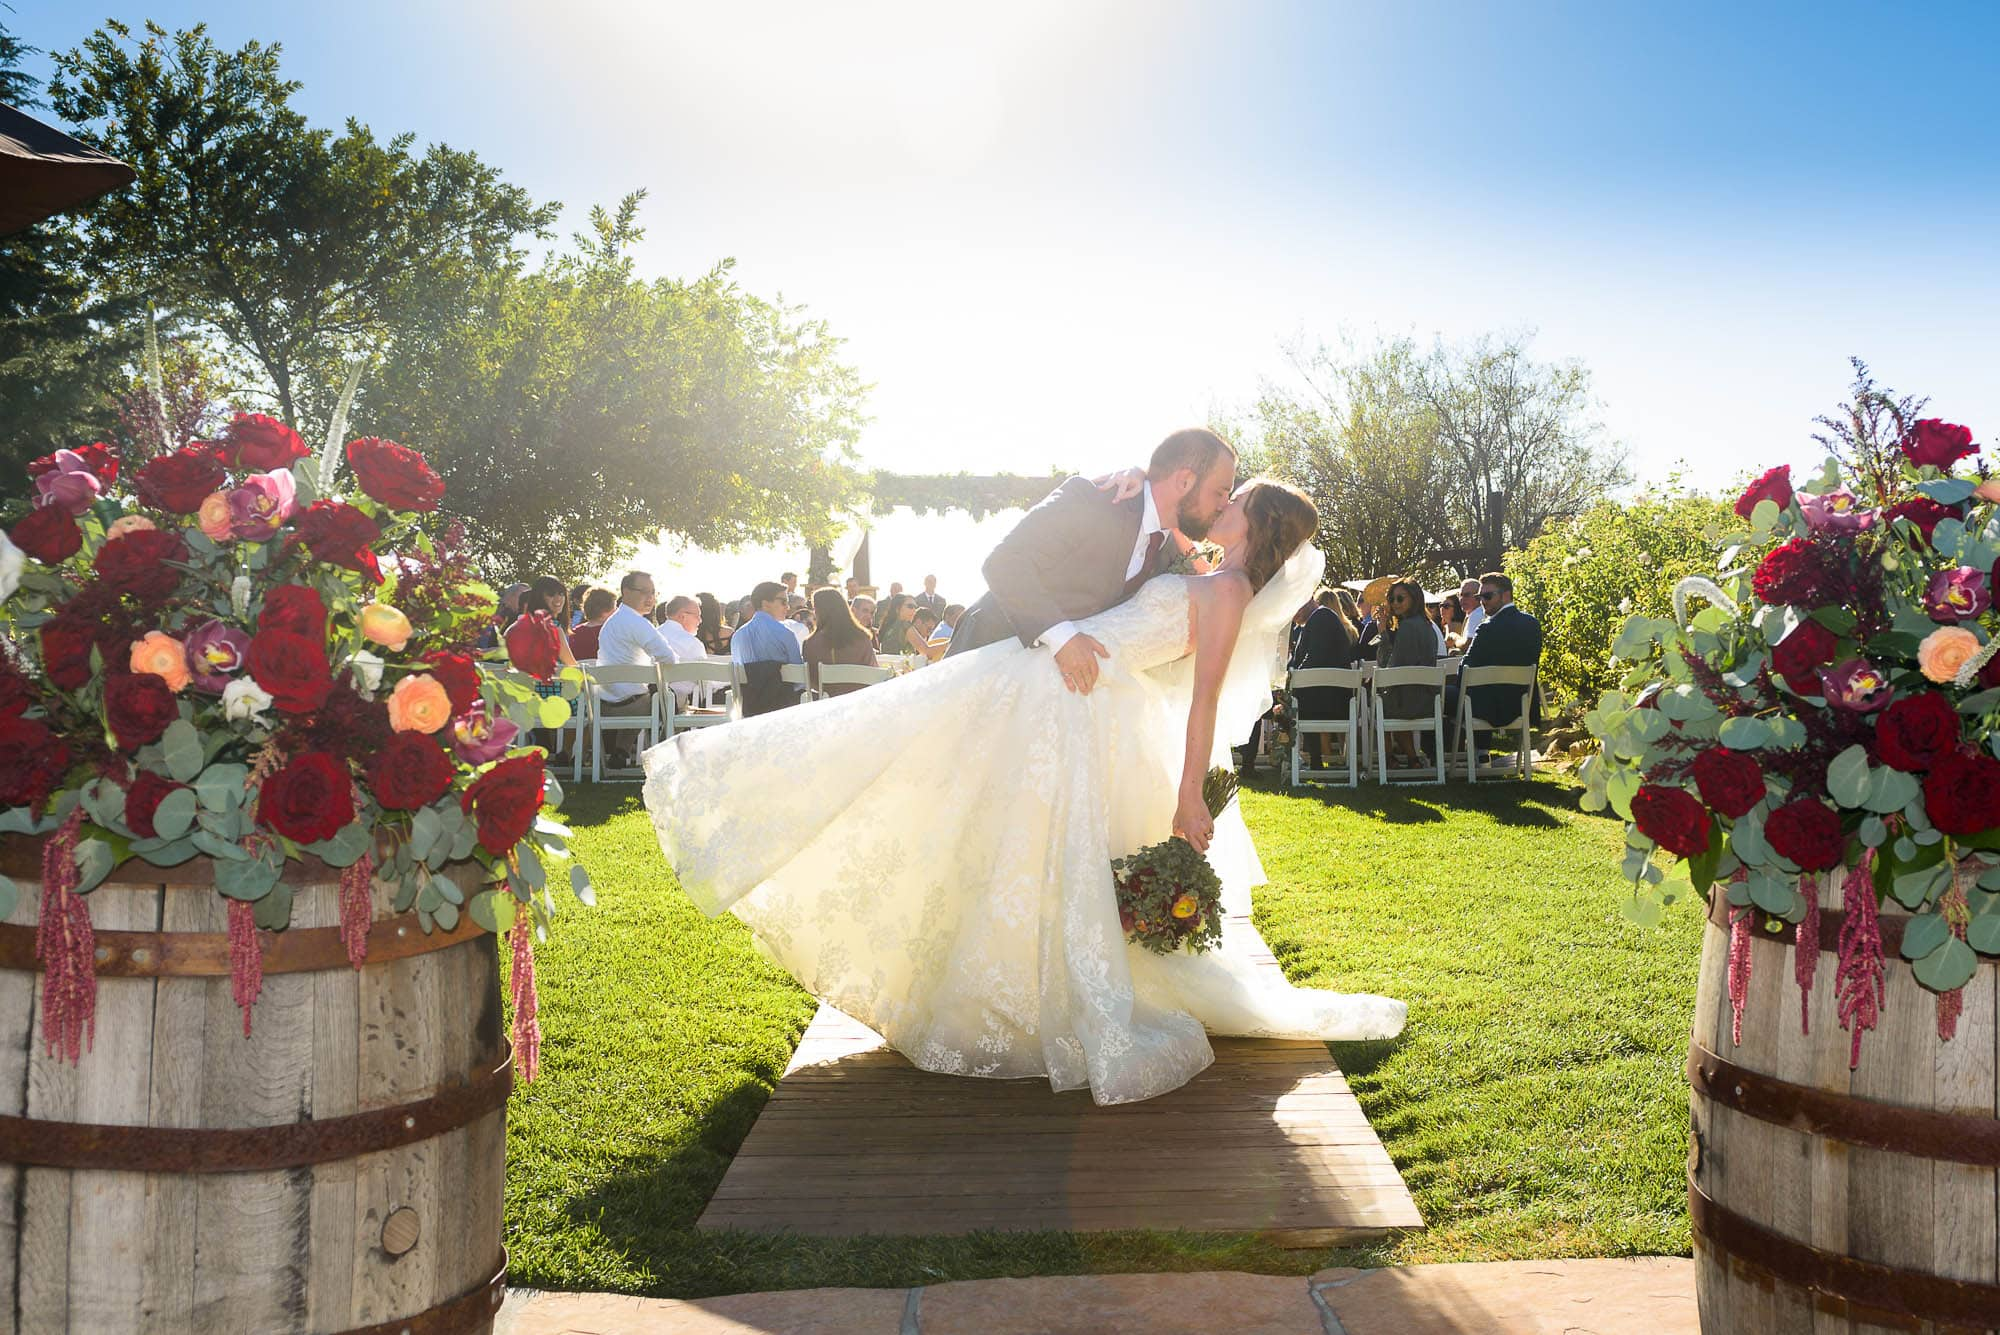 304_Alan_and_Heidi_Serendipity_Garden_Wedding_10-27-2018